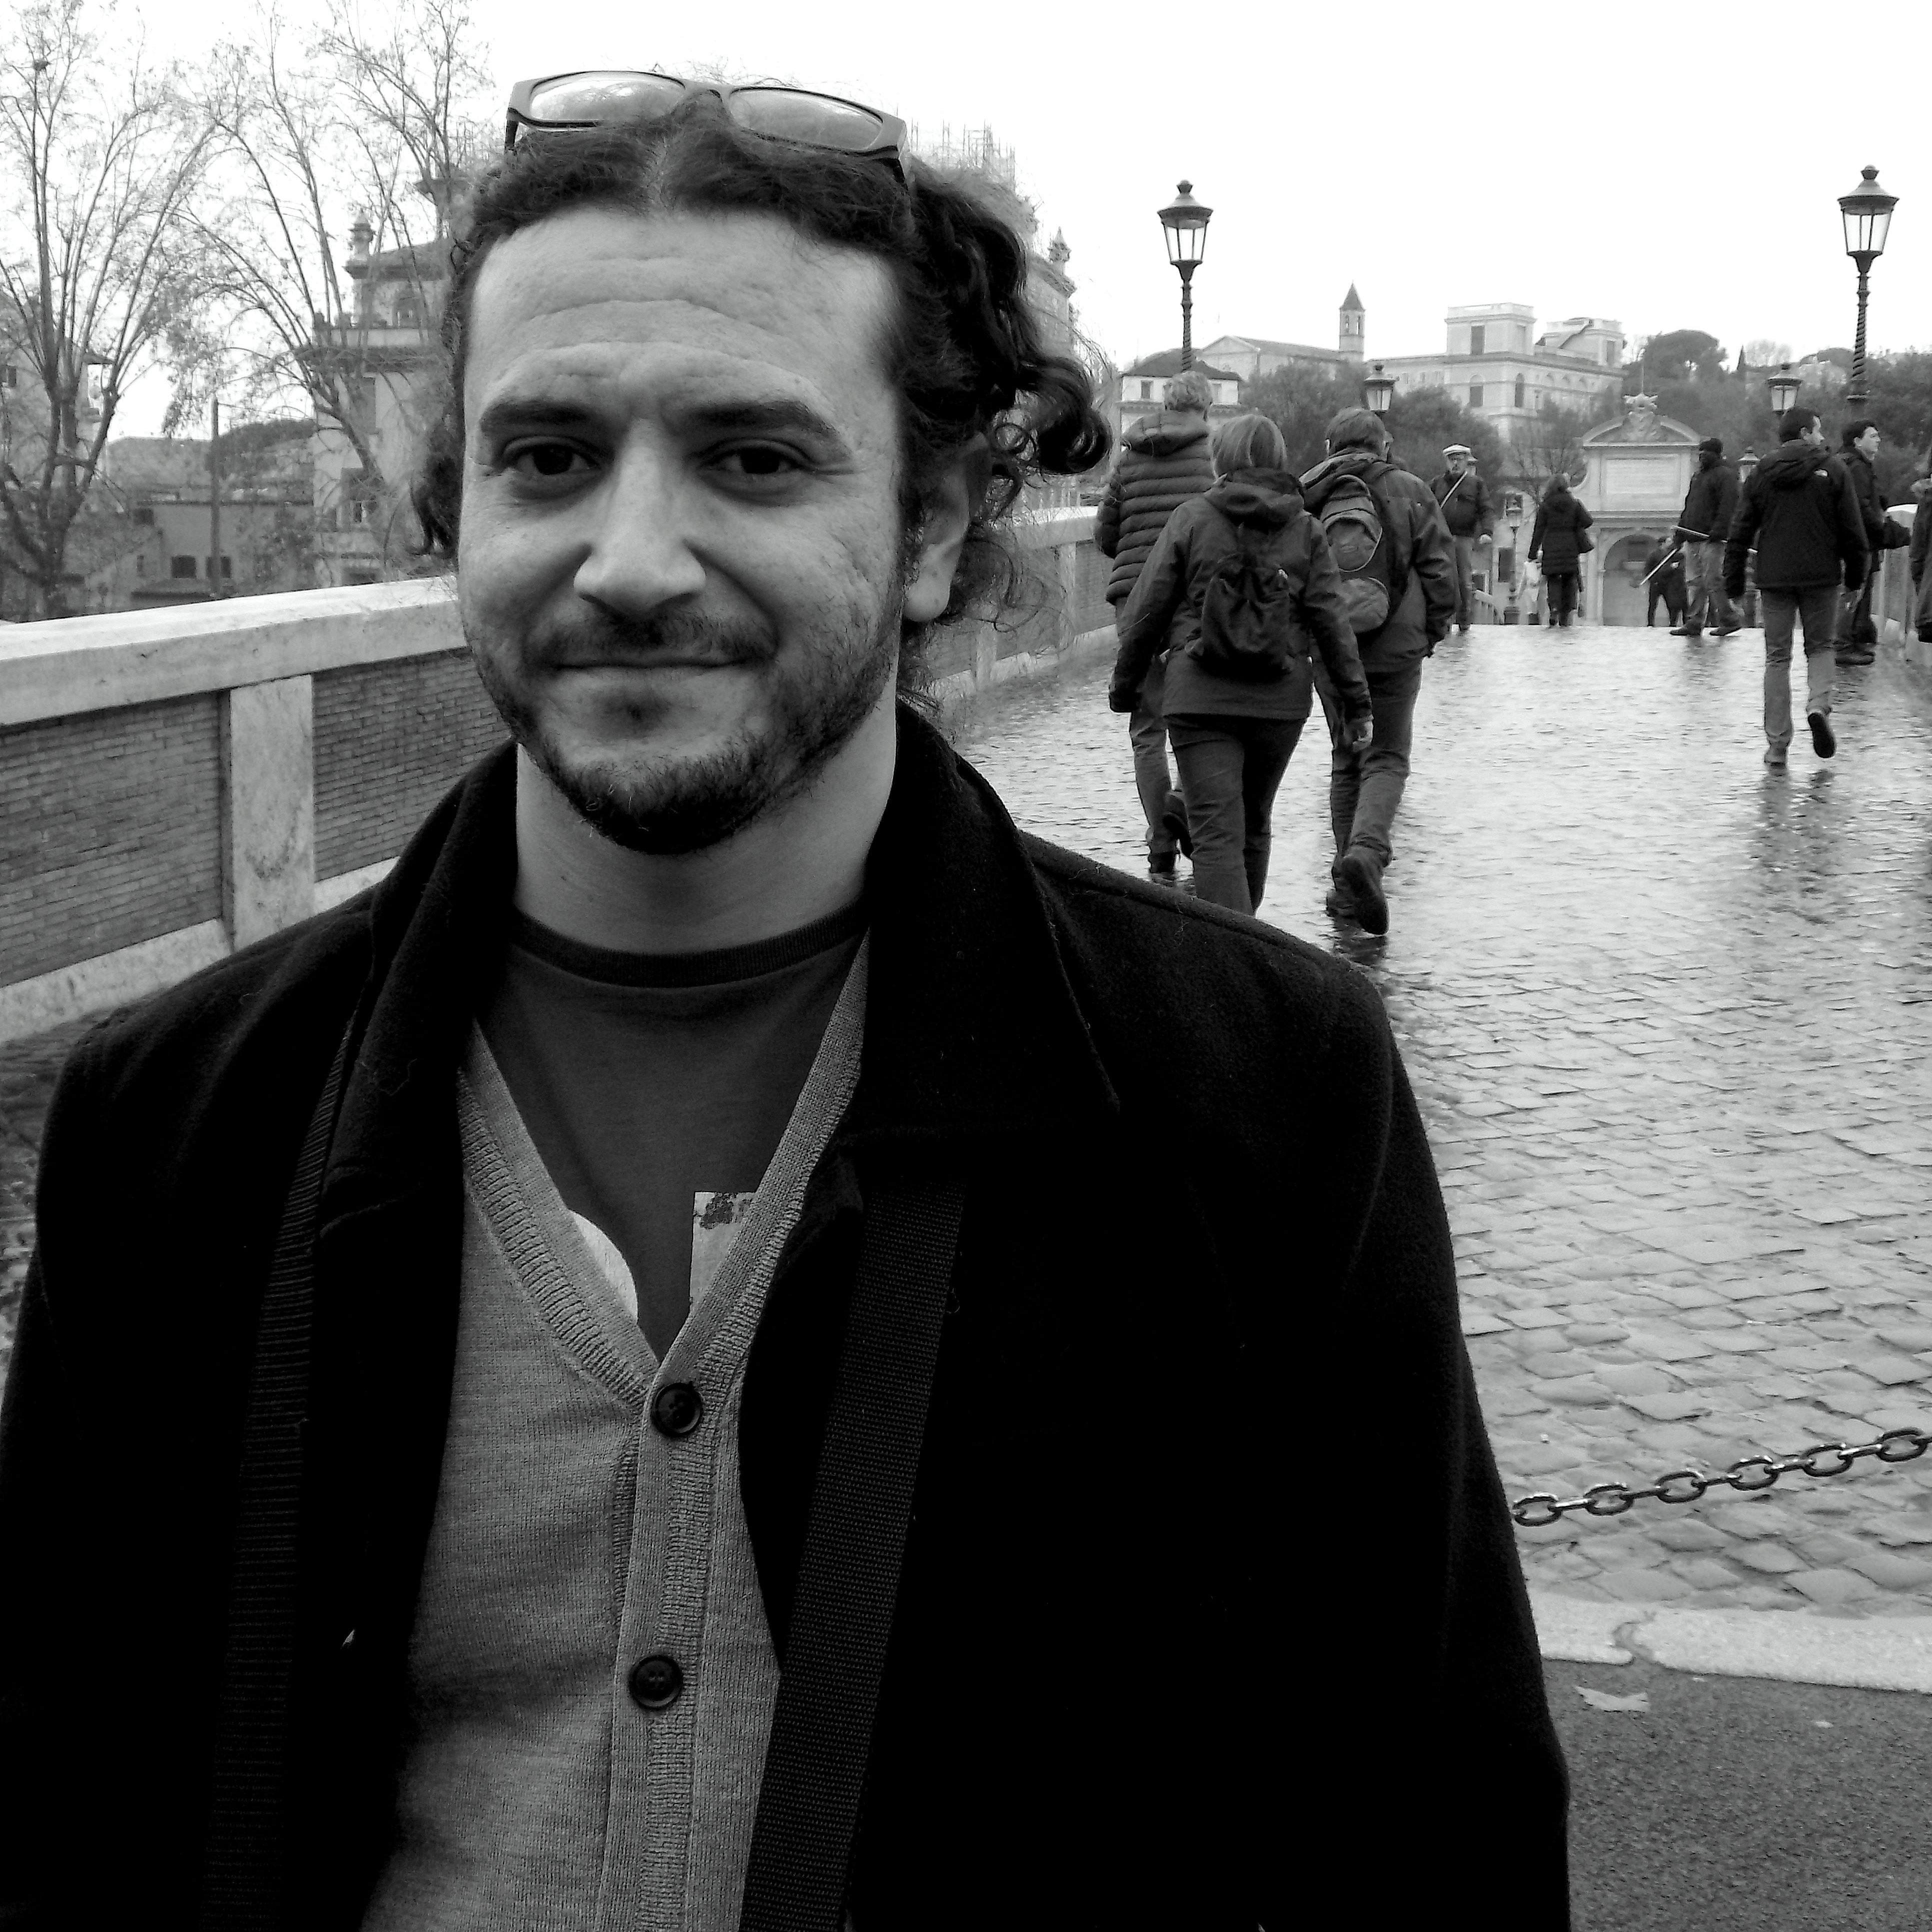 Manuel Contreras Vázquez